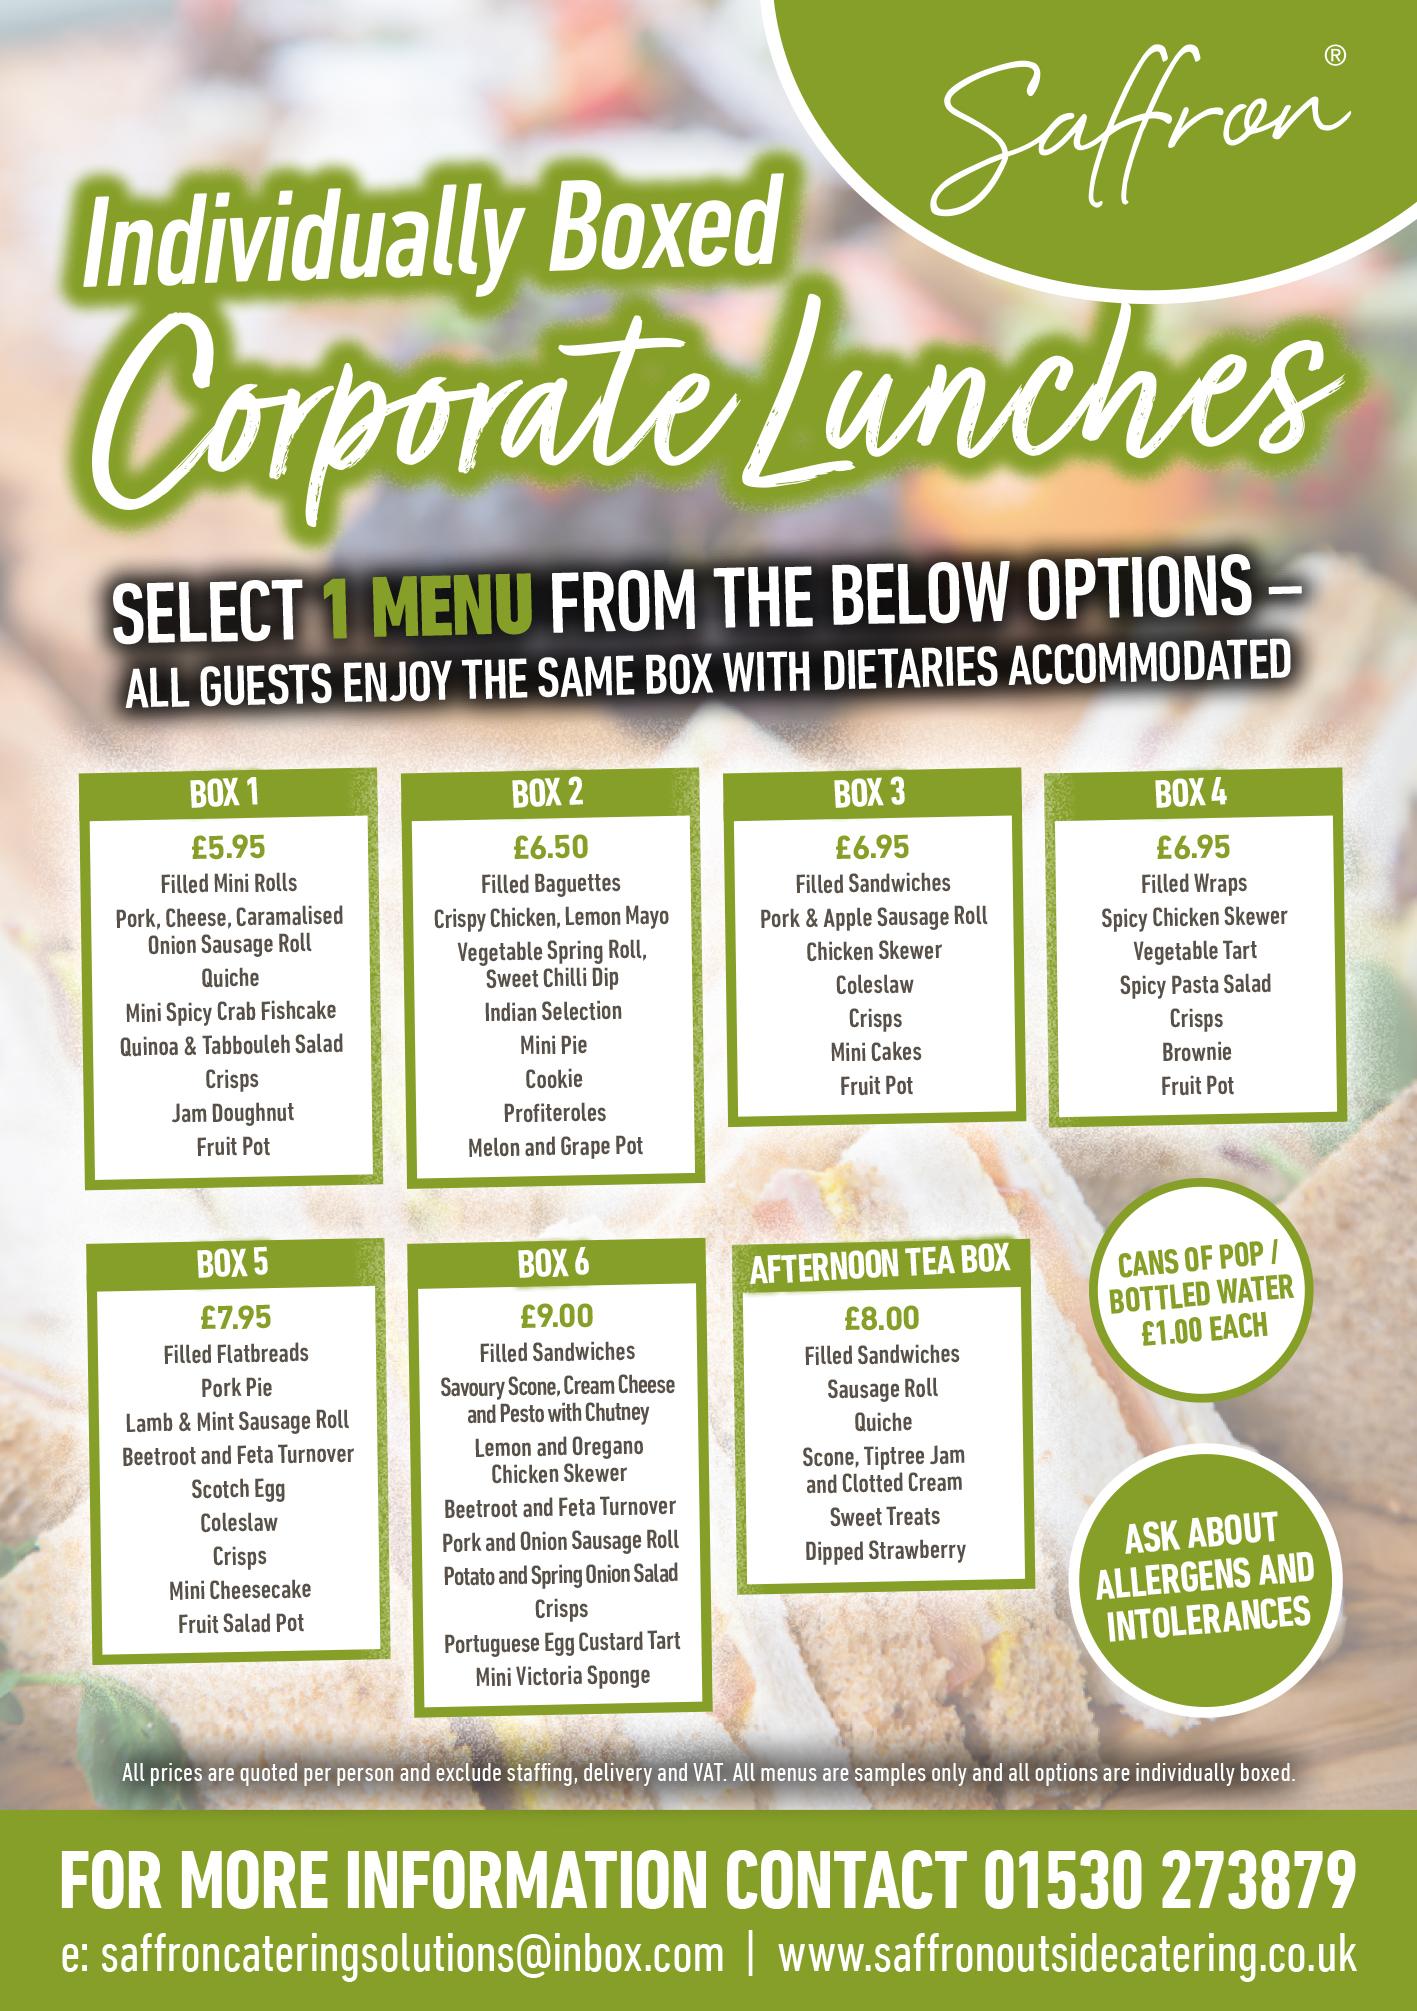 Saffron Corporate Menus Flyer Jun 21a - Corporate Lunches